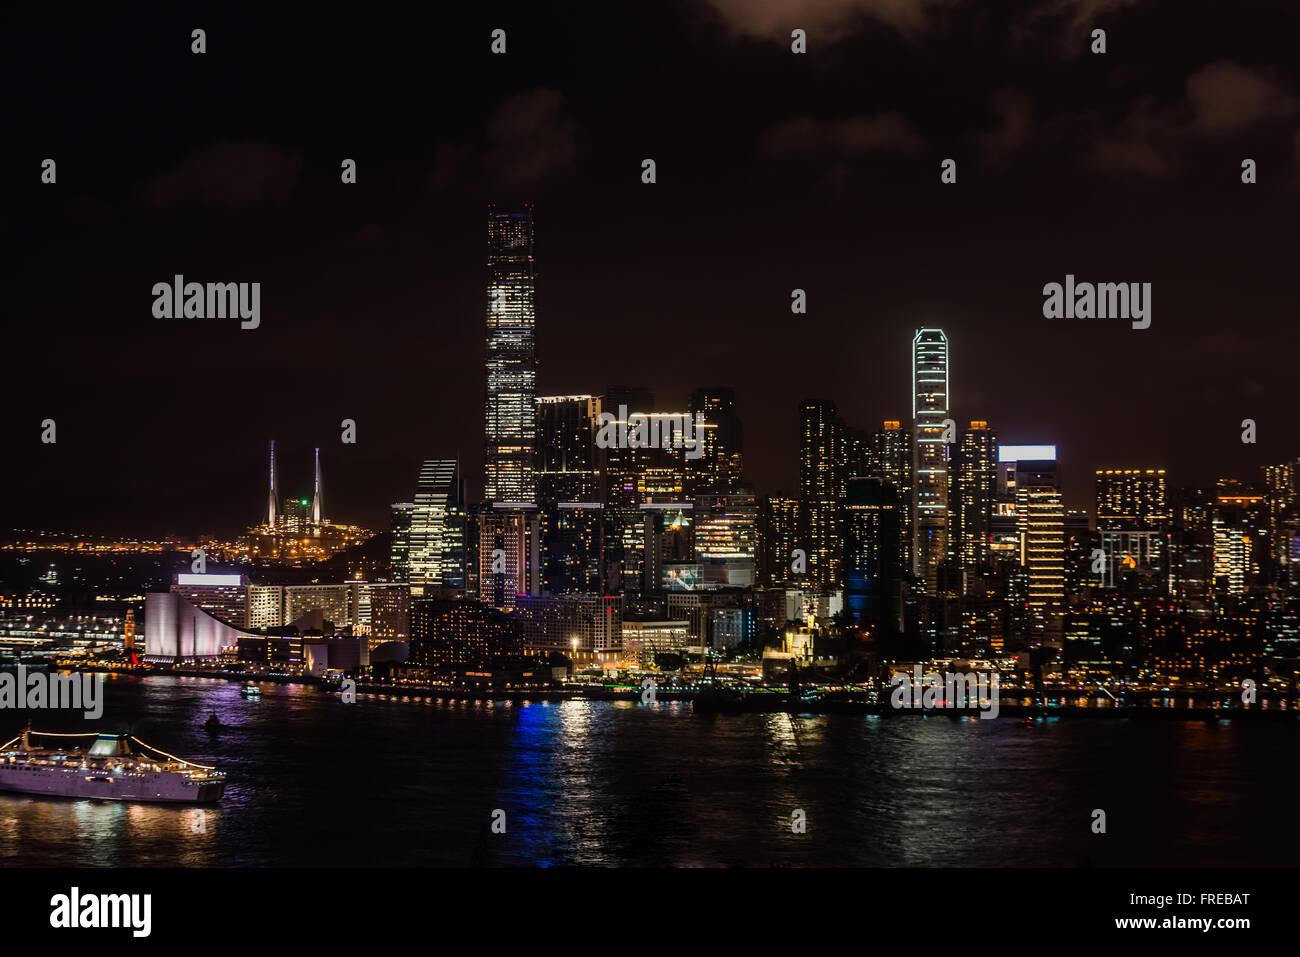 cityscape at night on Tsim Sha Tsui in Hong Kong - Stock Image